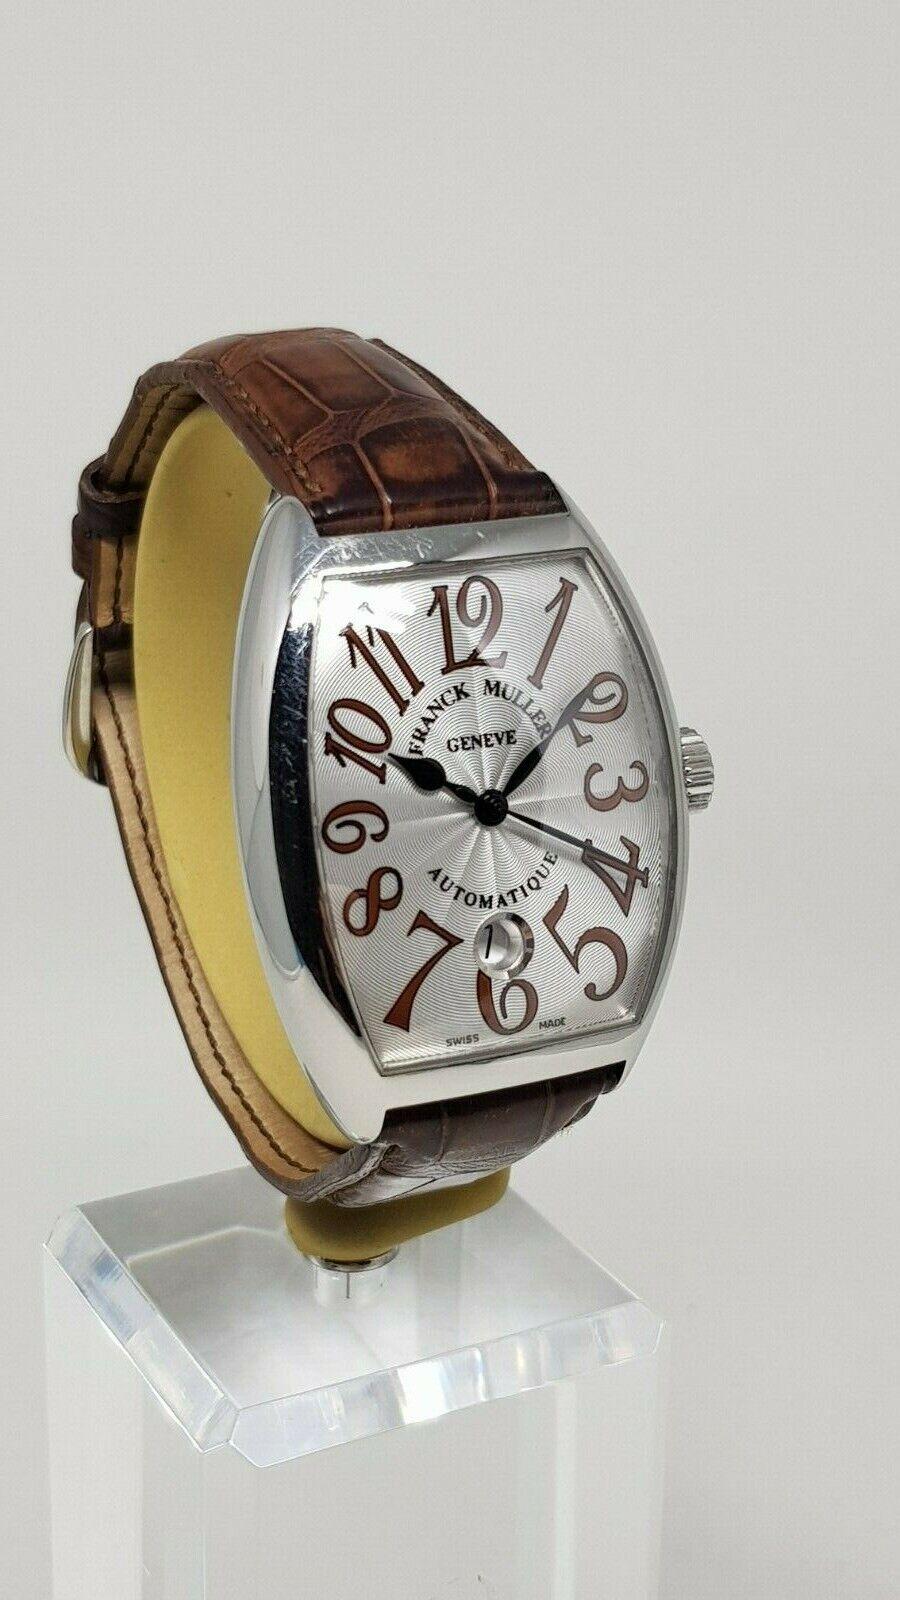 Franck Muller Cintrée Curvex 7851 SC DT - watch picture 1